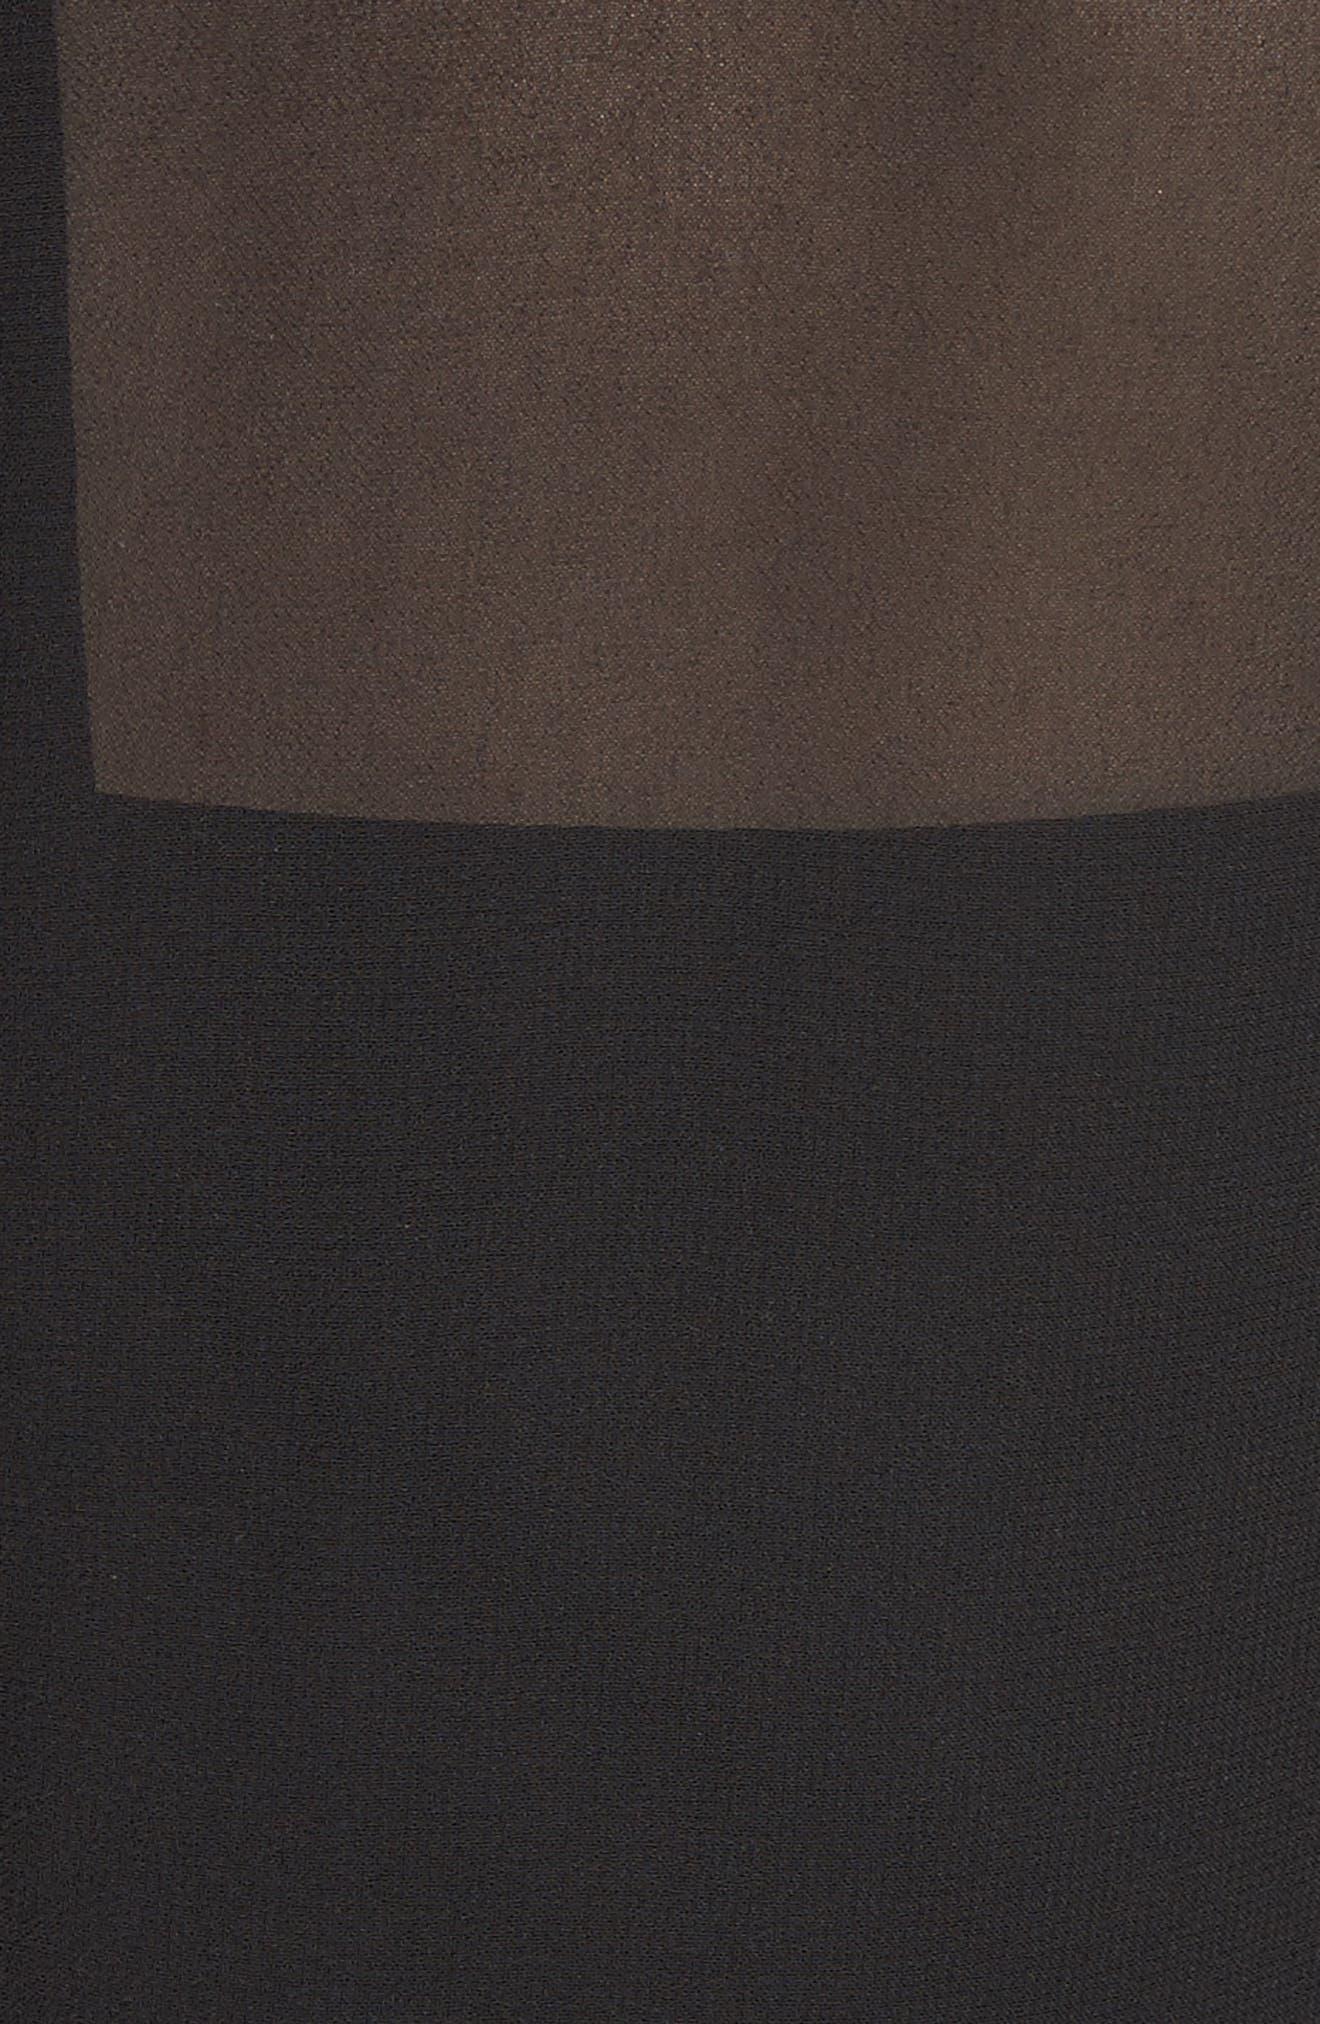 Lace Trim Pleated Midi Dress,                             Alternate thumbnail 5, color,                             001